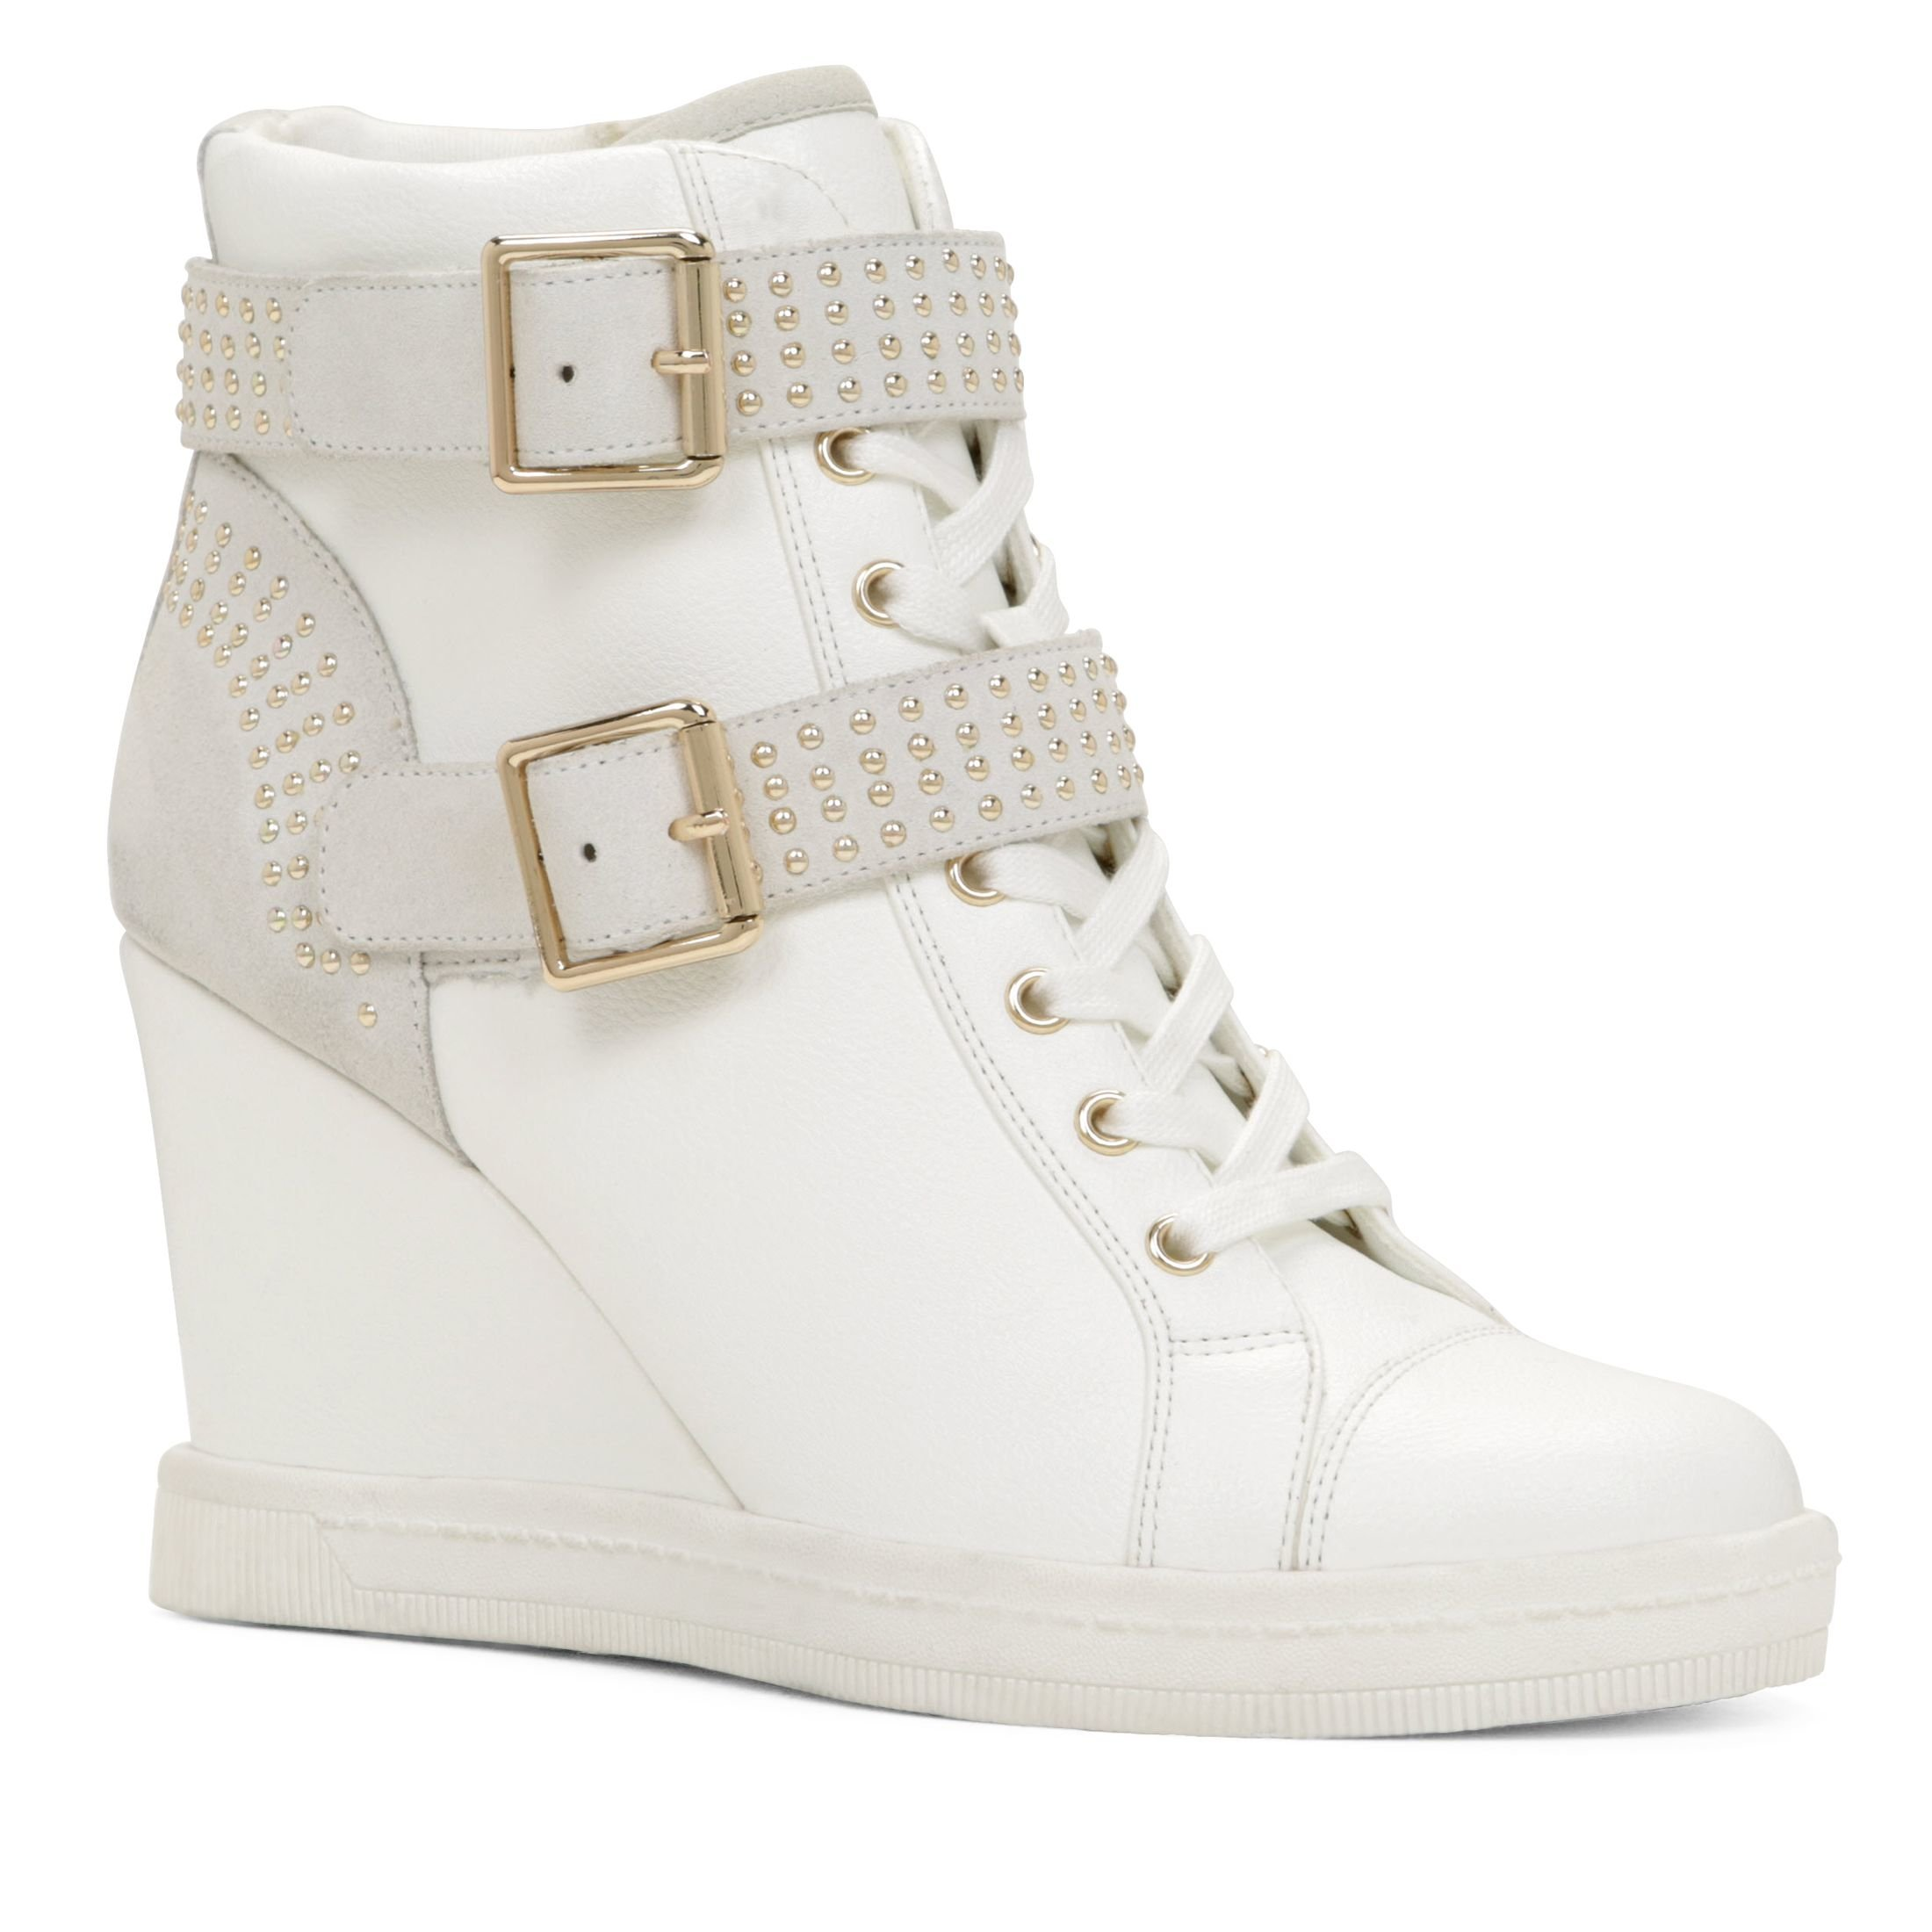 aldo verratti wedge sneaker in white lyst